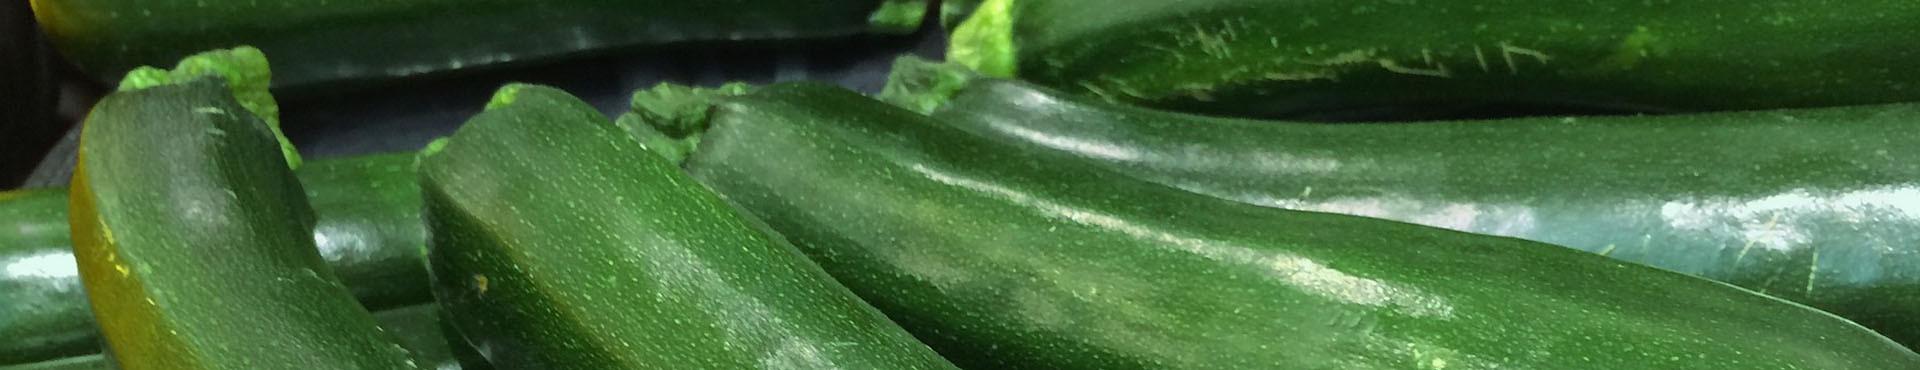 Semi di zucchino